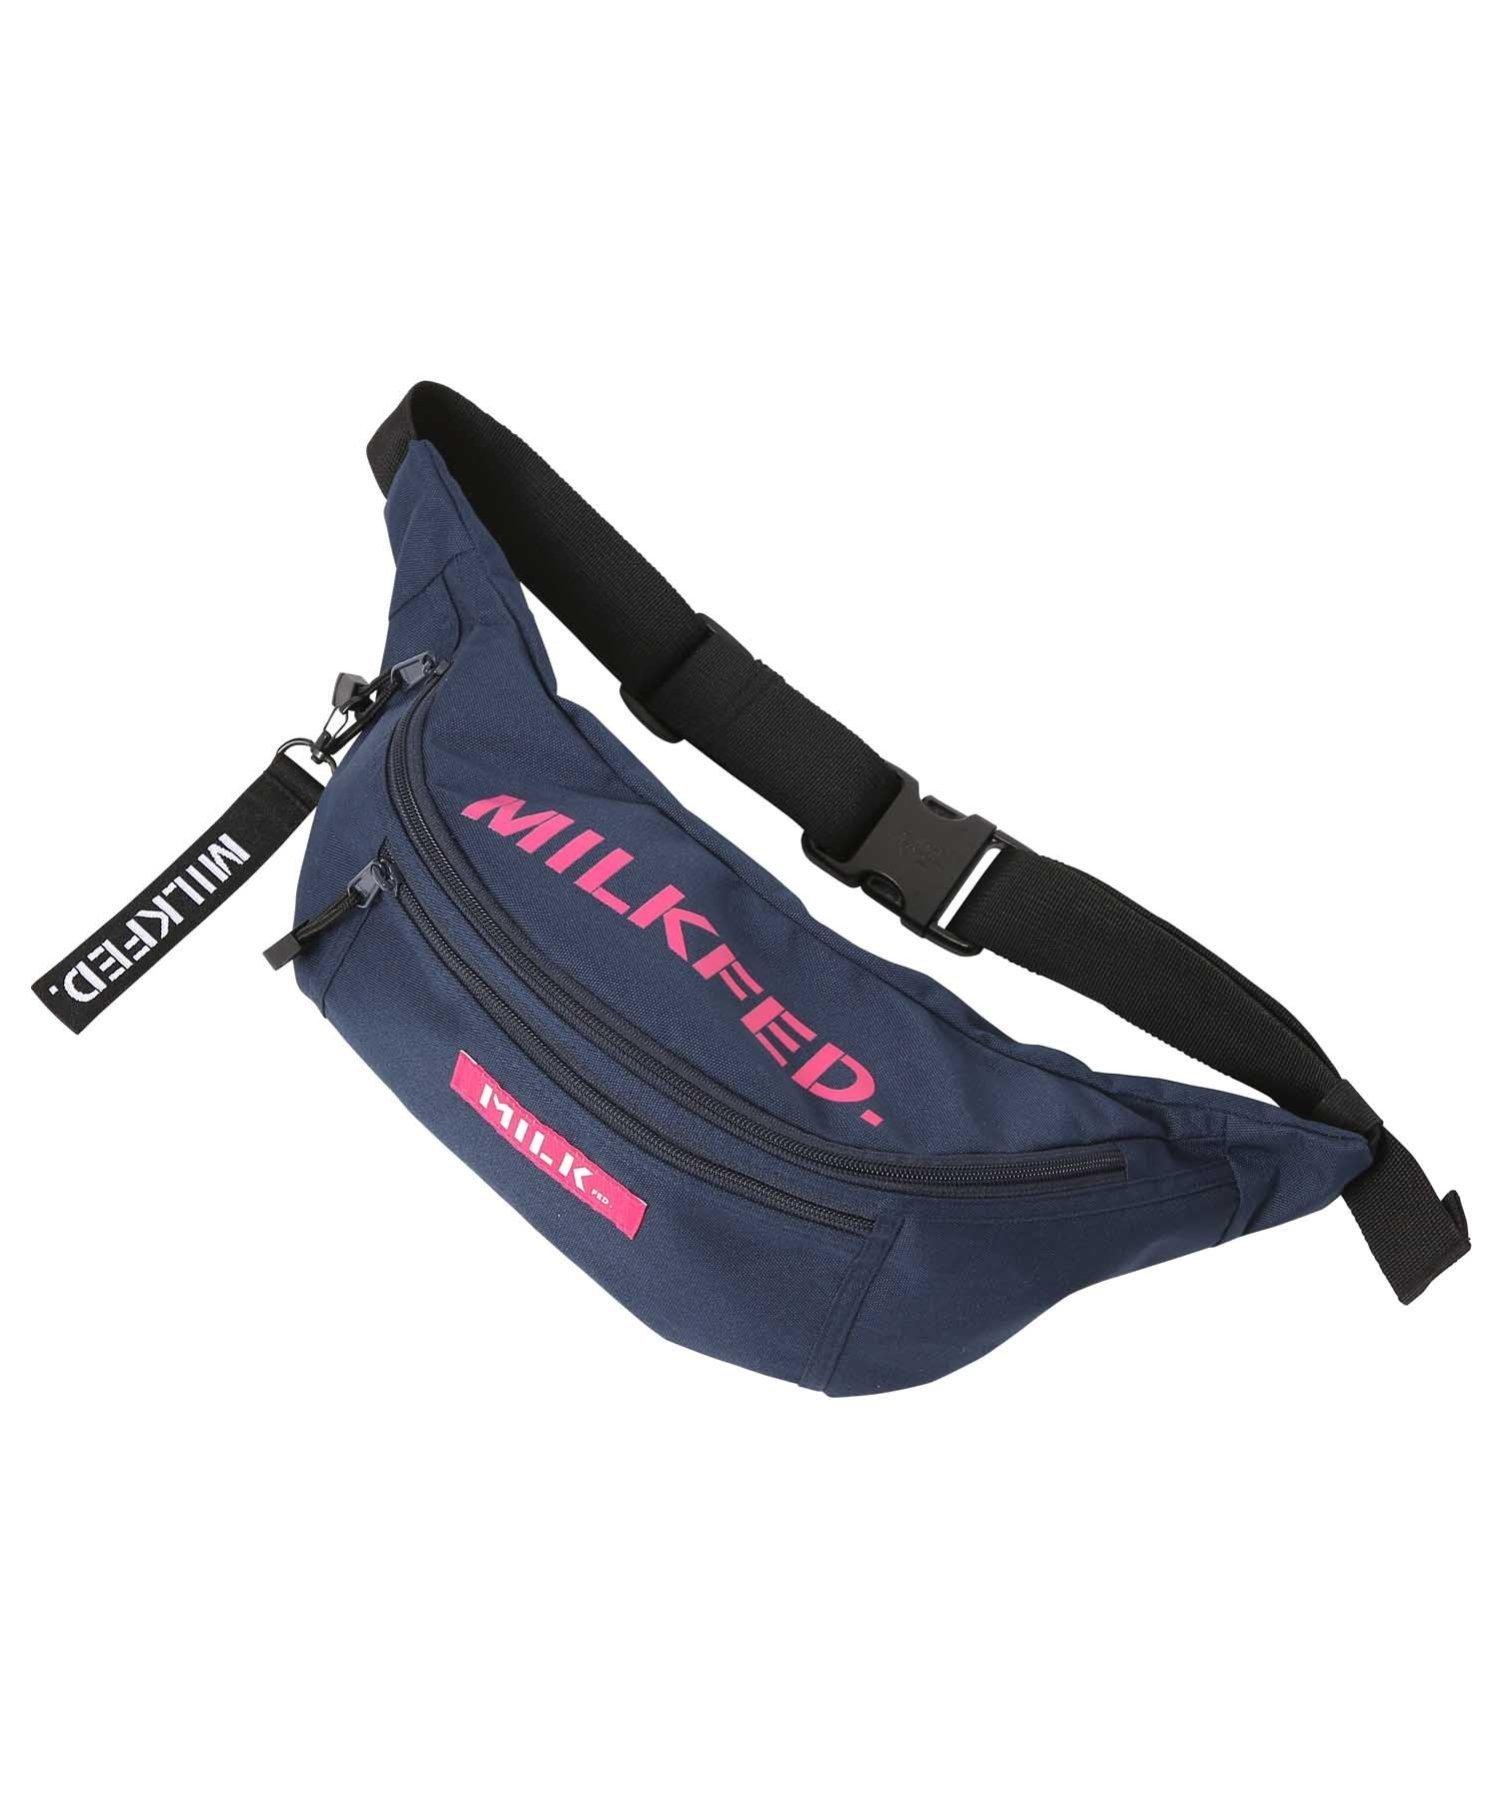 MILKFED. TOP LOGO FANNY PACK ミルクフェド バッグ【送料無料】